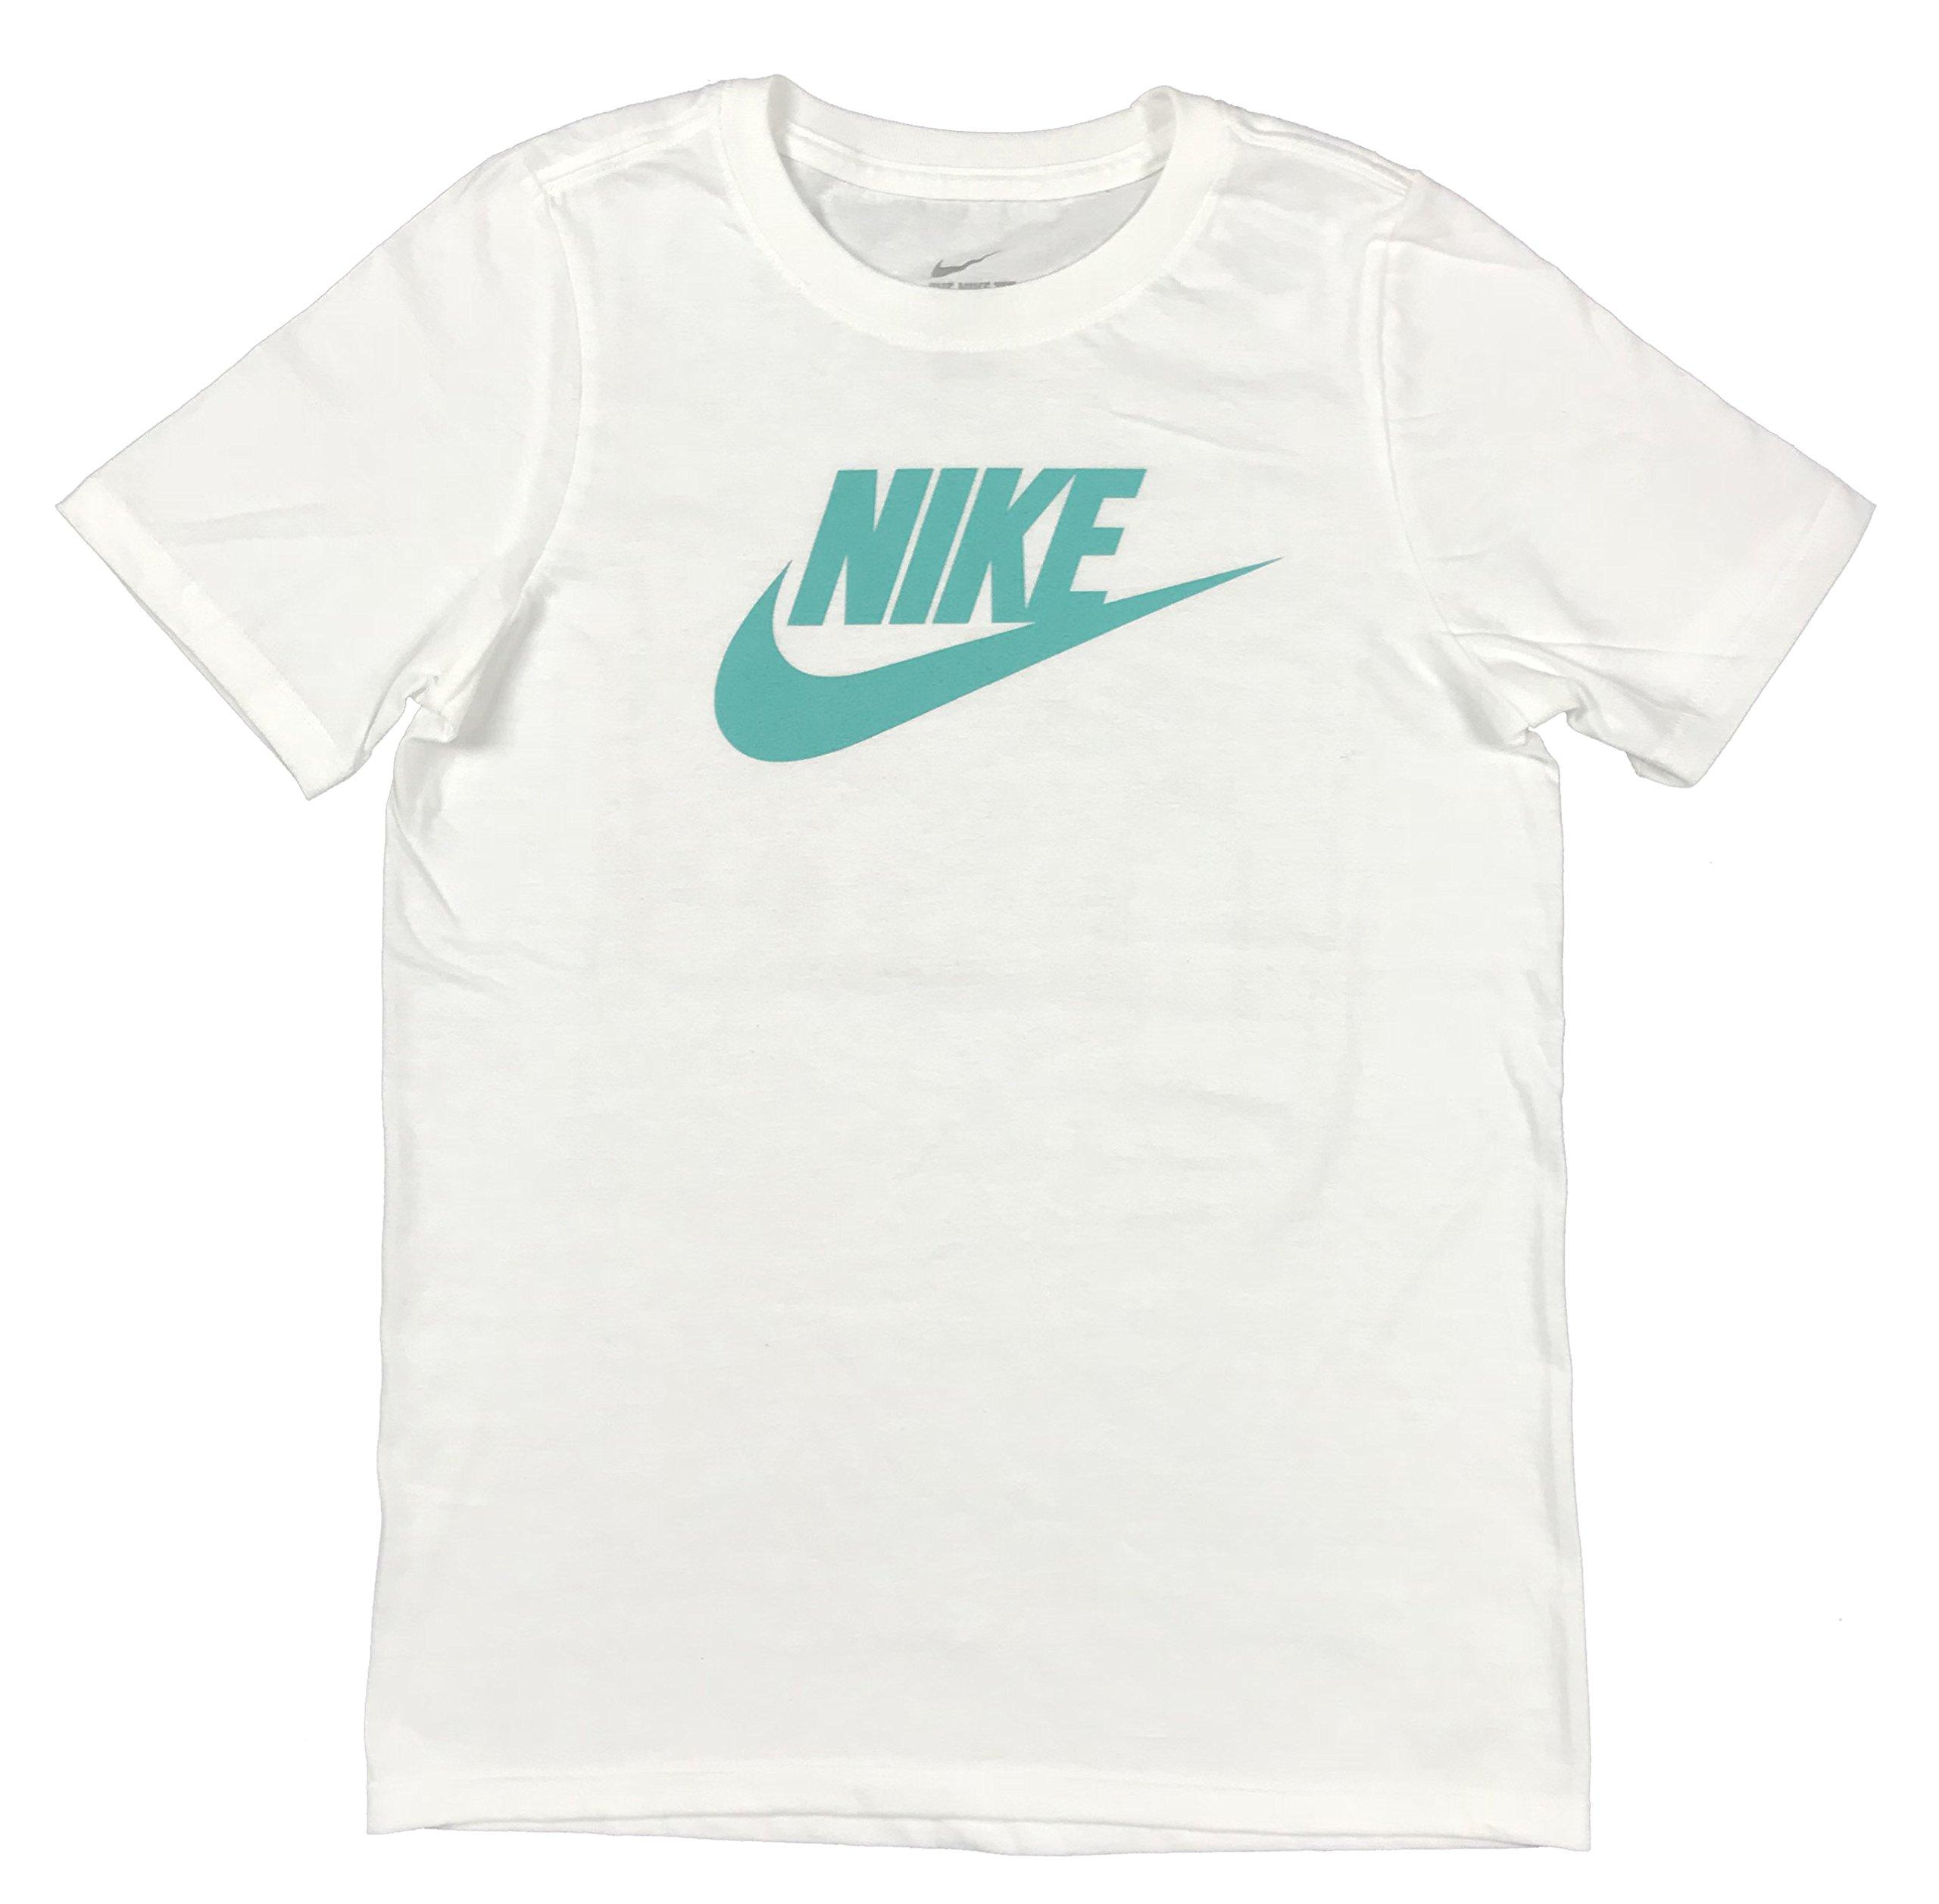 Nike Boys Classic Swoosh Logo Graphic Cotton Shirt White/Teal (Medium)